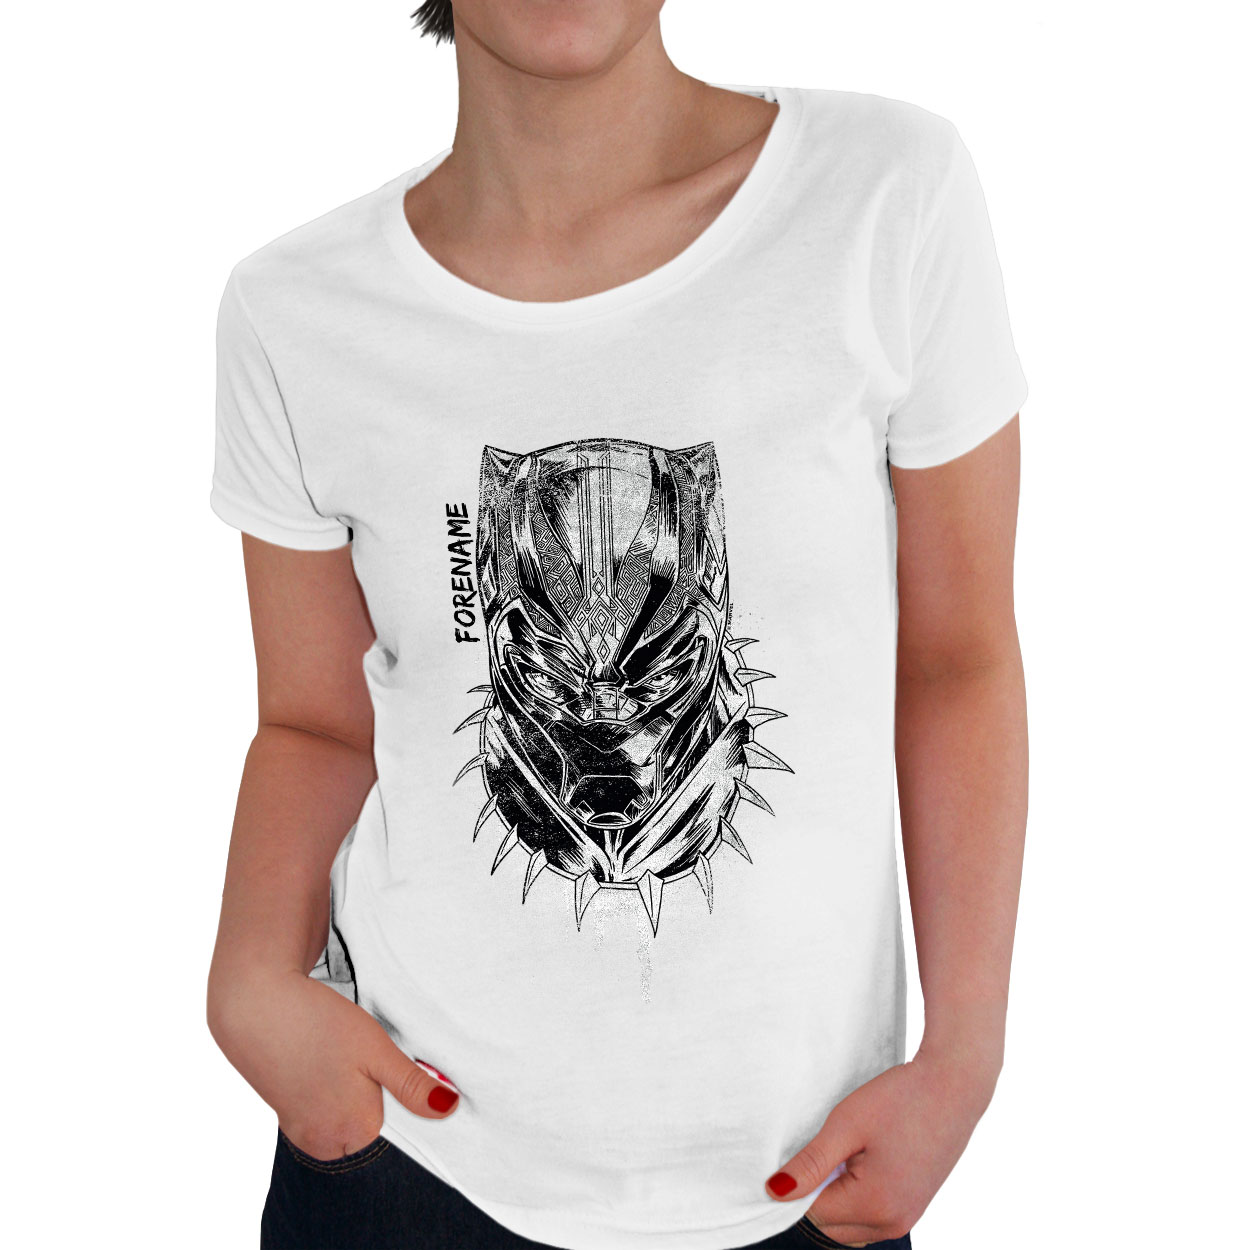 Marvel Black Panther Sketch Ladies T-Shirt